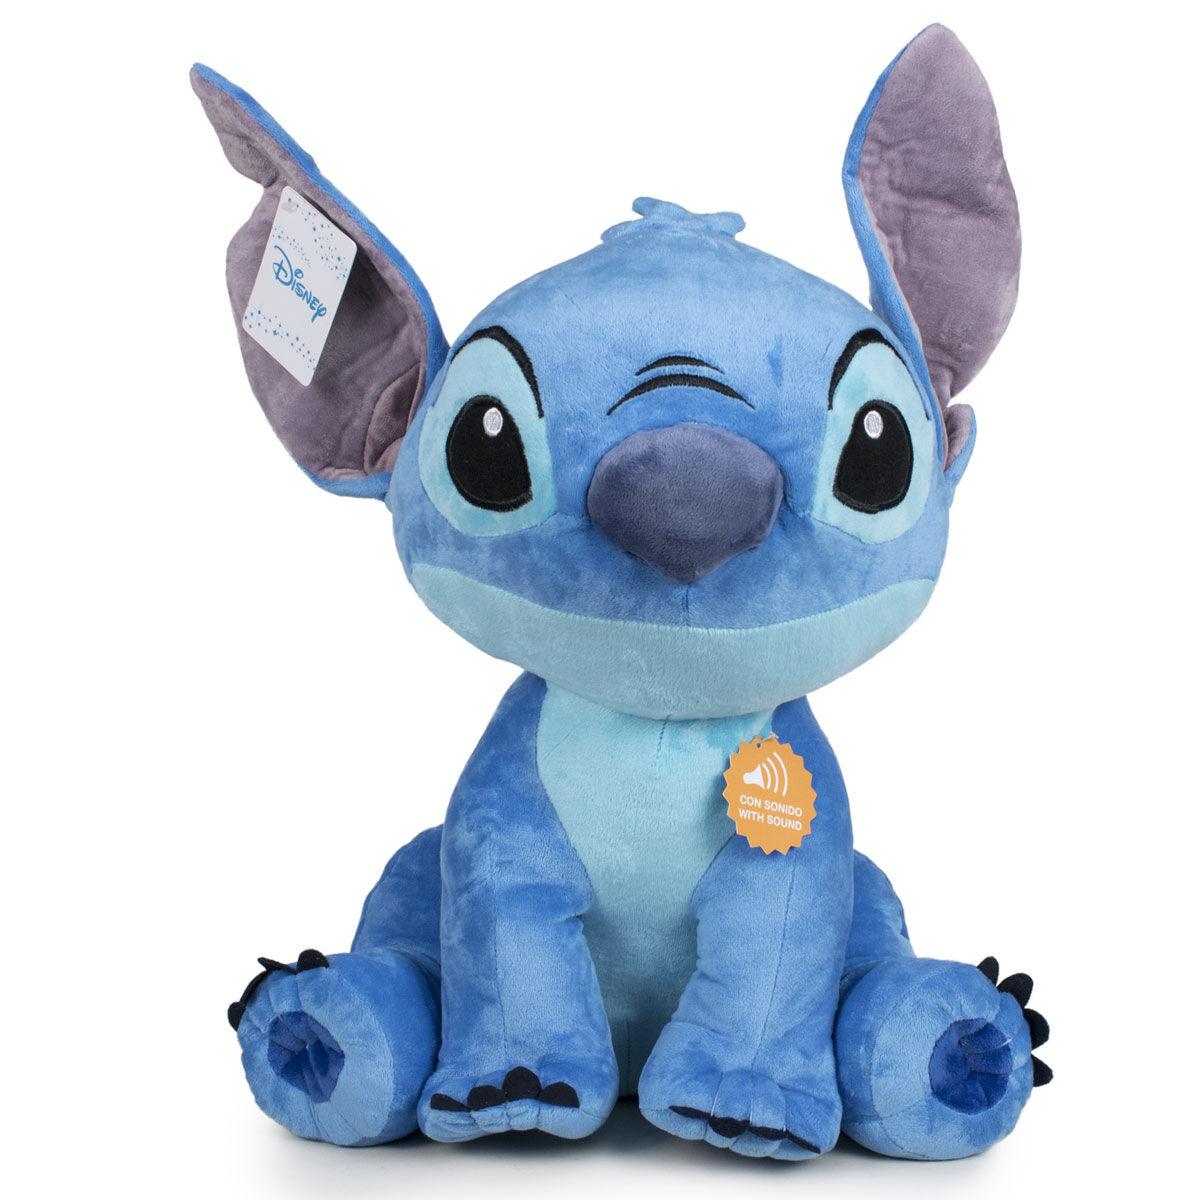 Peluche Stitch Disney sonido soft 60cm 8425611642814